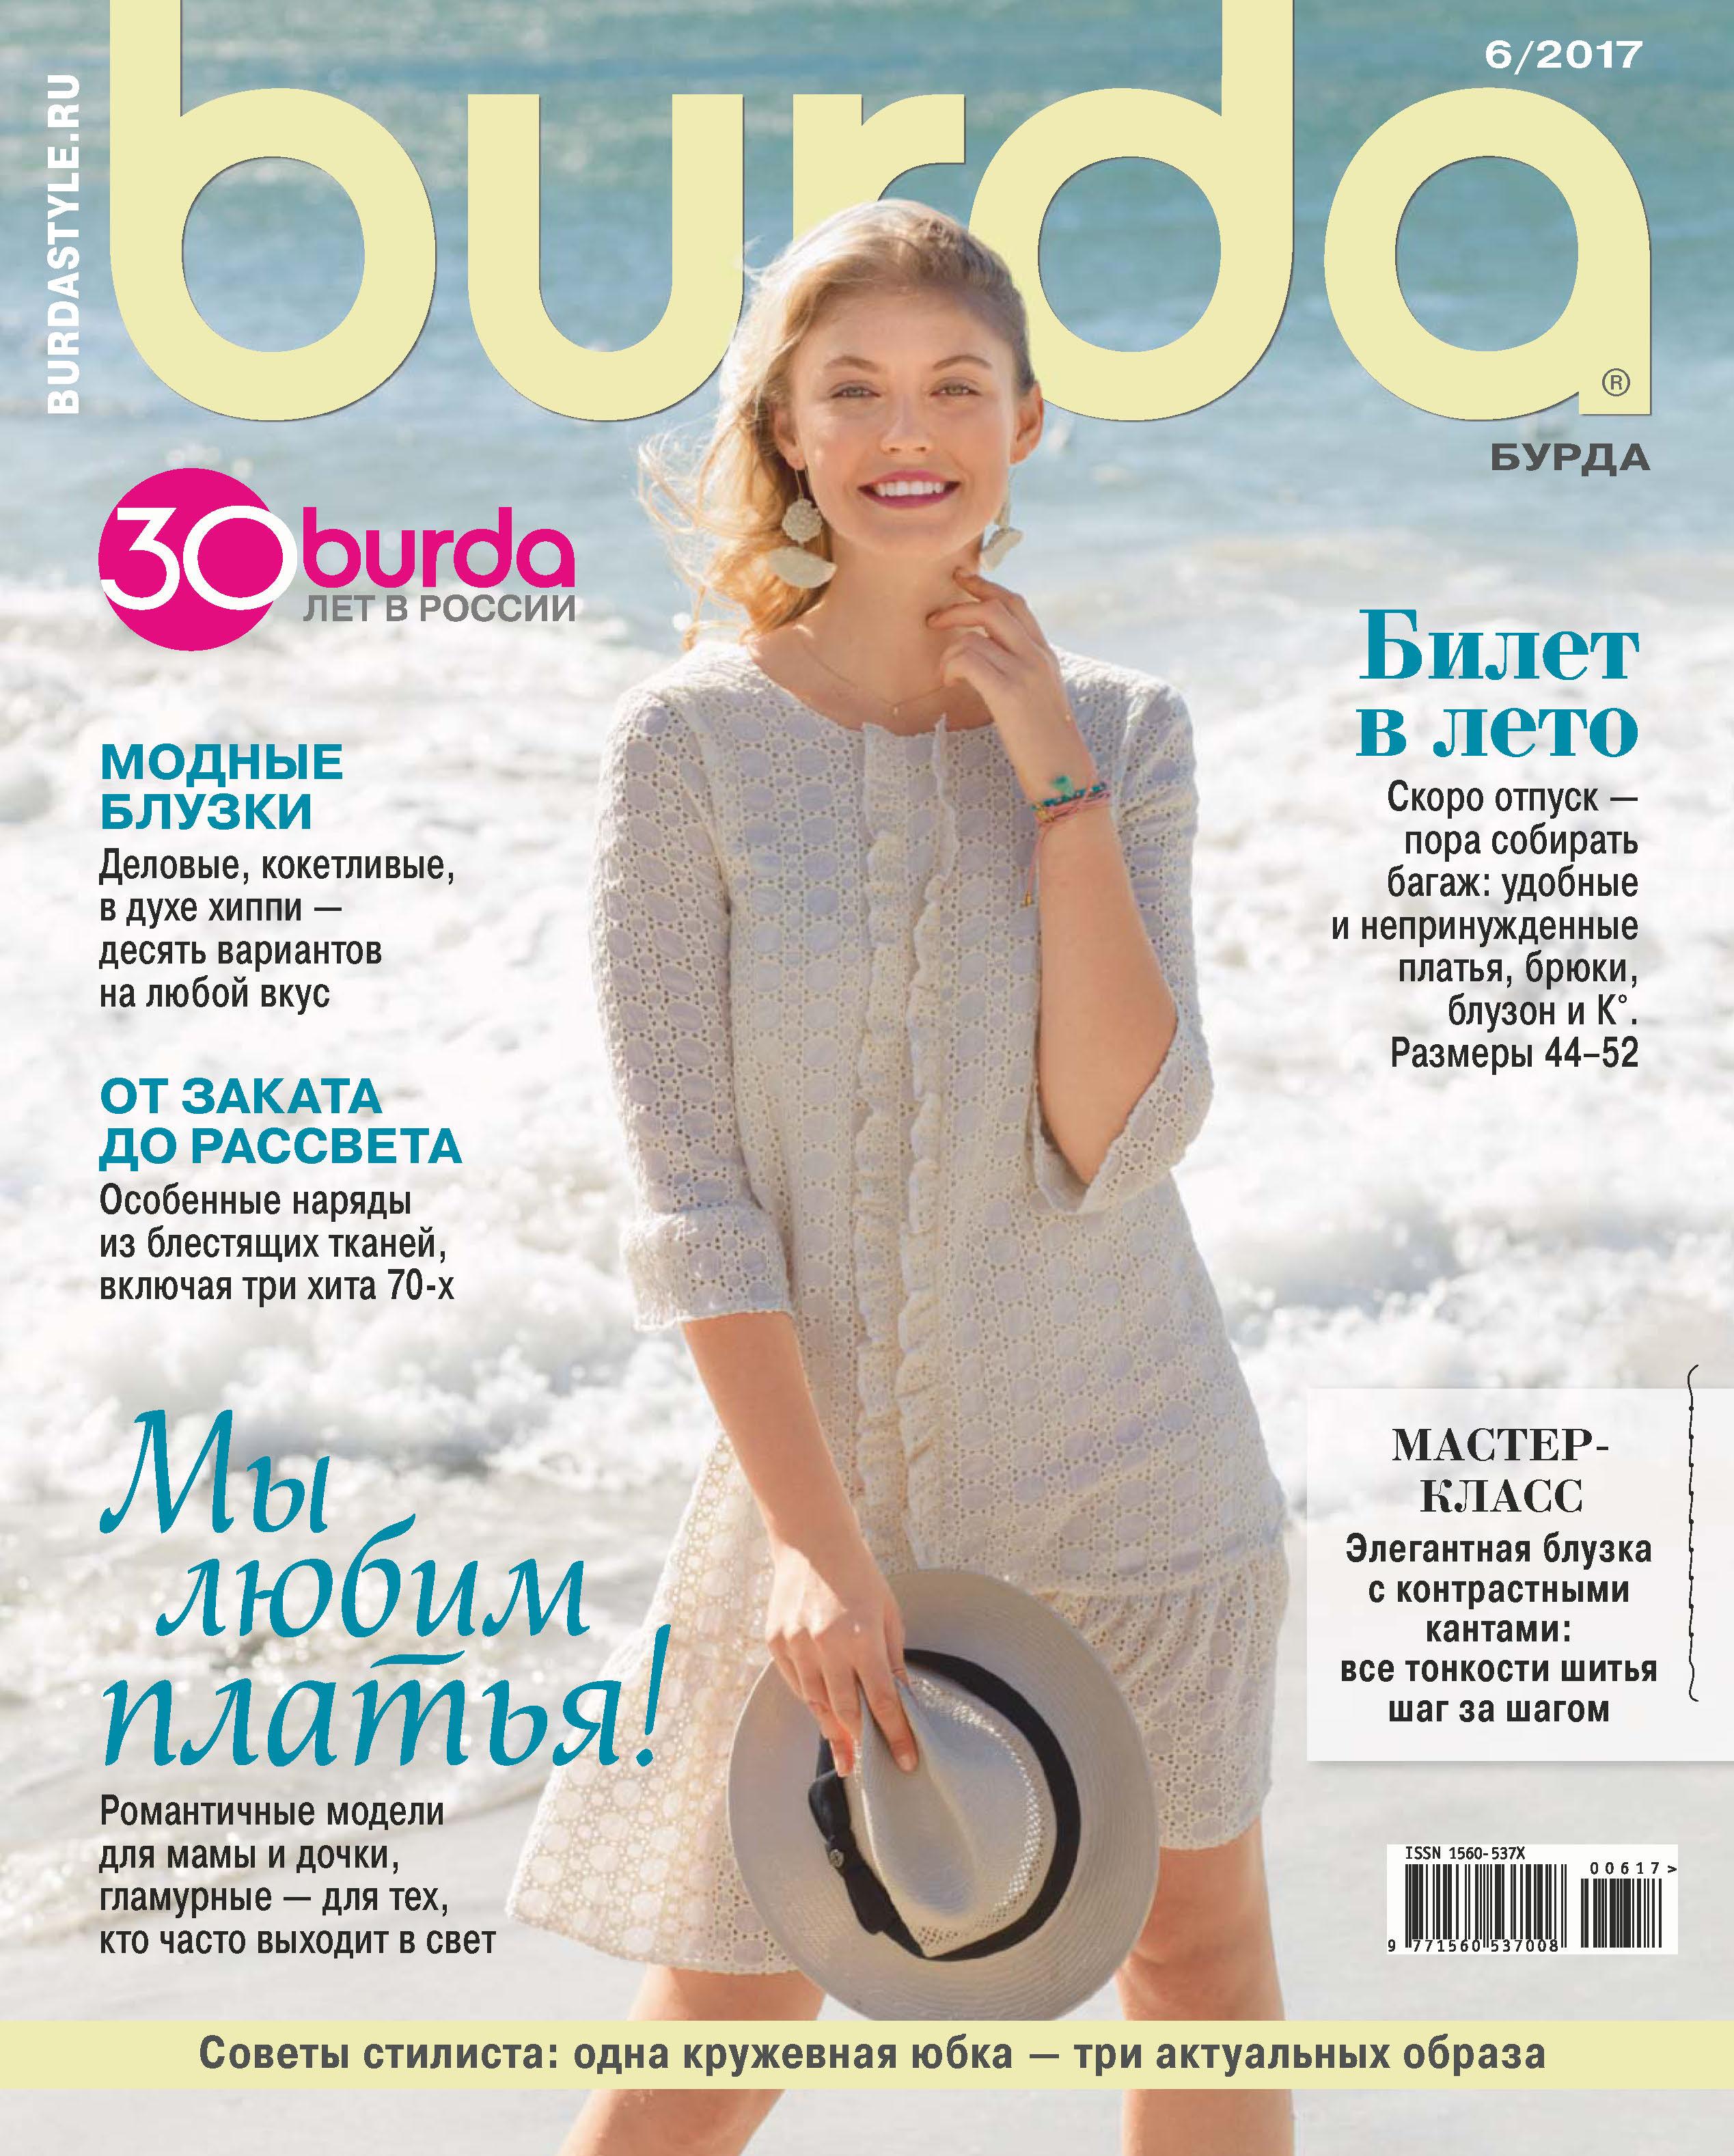 ИД «Бурда» Burda №06/2017 ид бурда burda special 02 2017